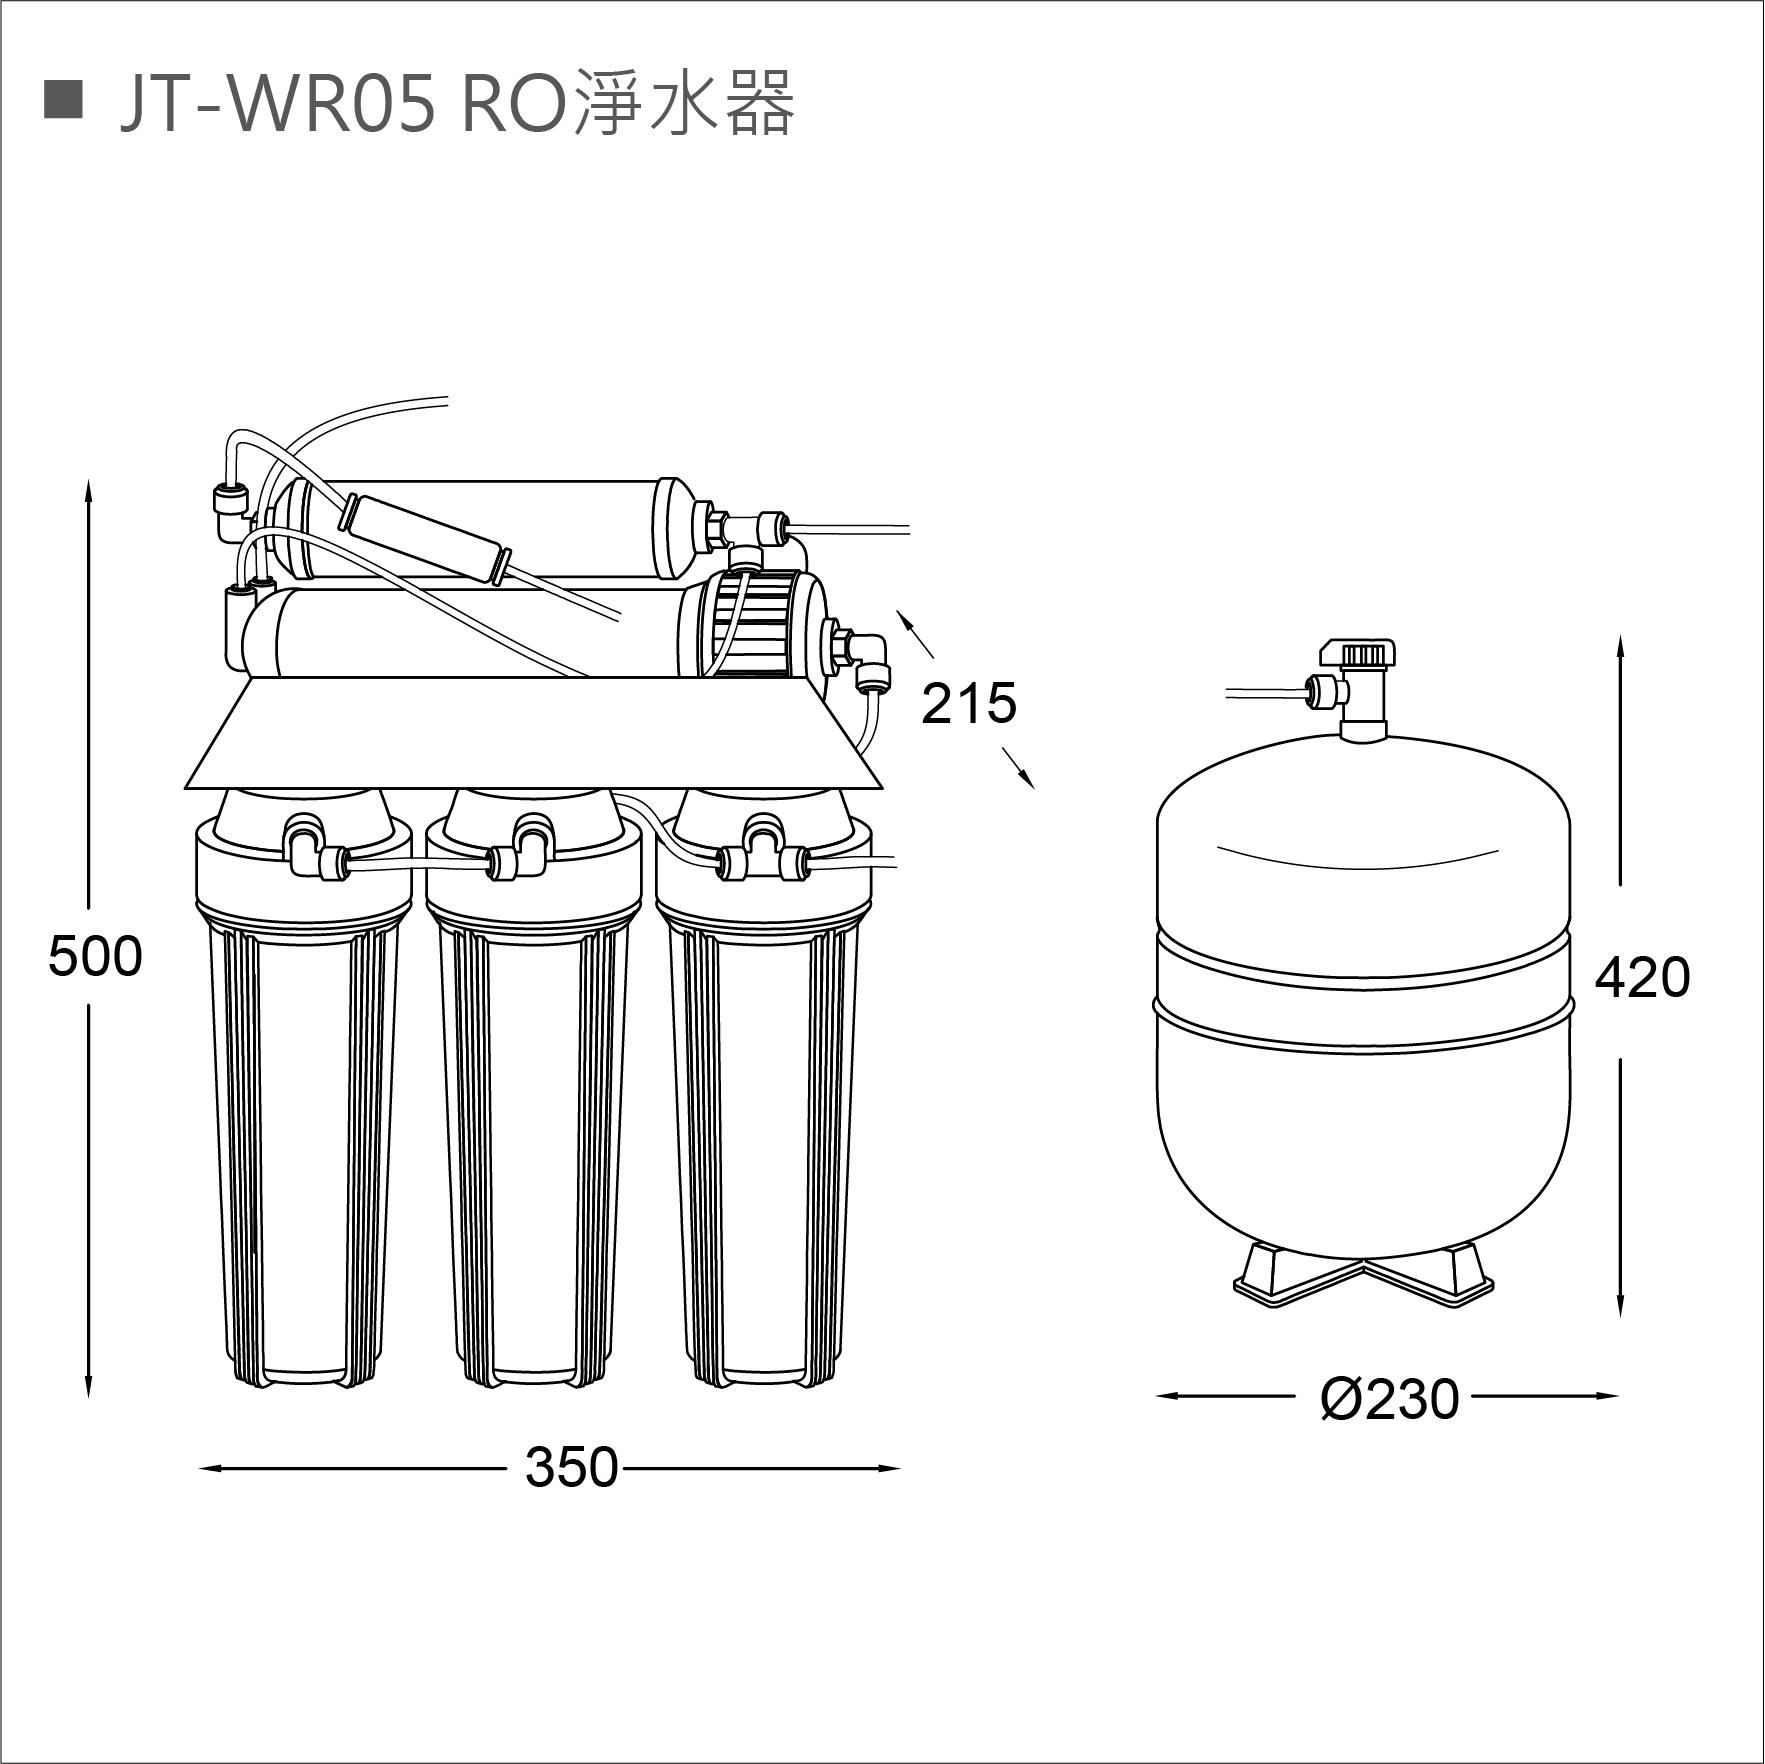 JT-WR05 五道式RO淨水器-JT-WR05